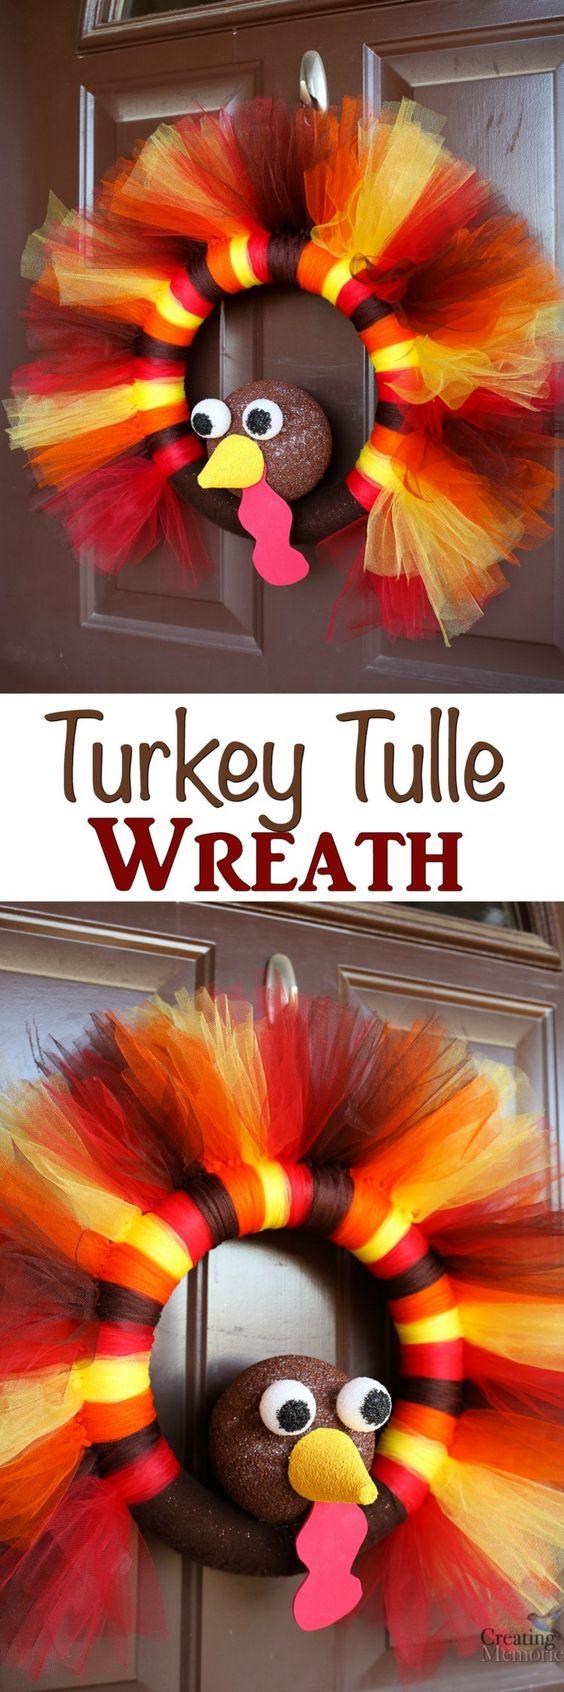 7 thanksgiving craft ideas